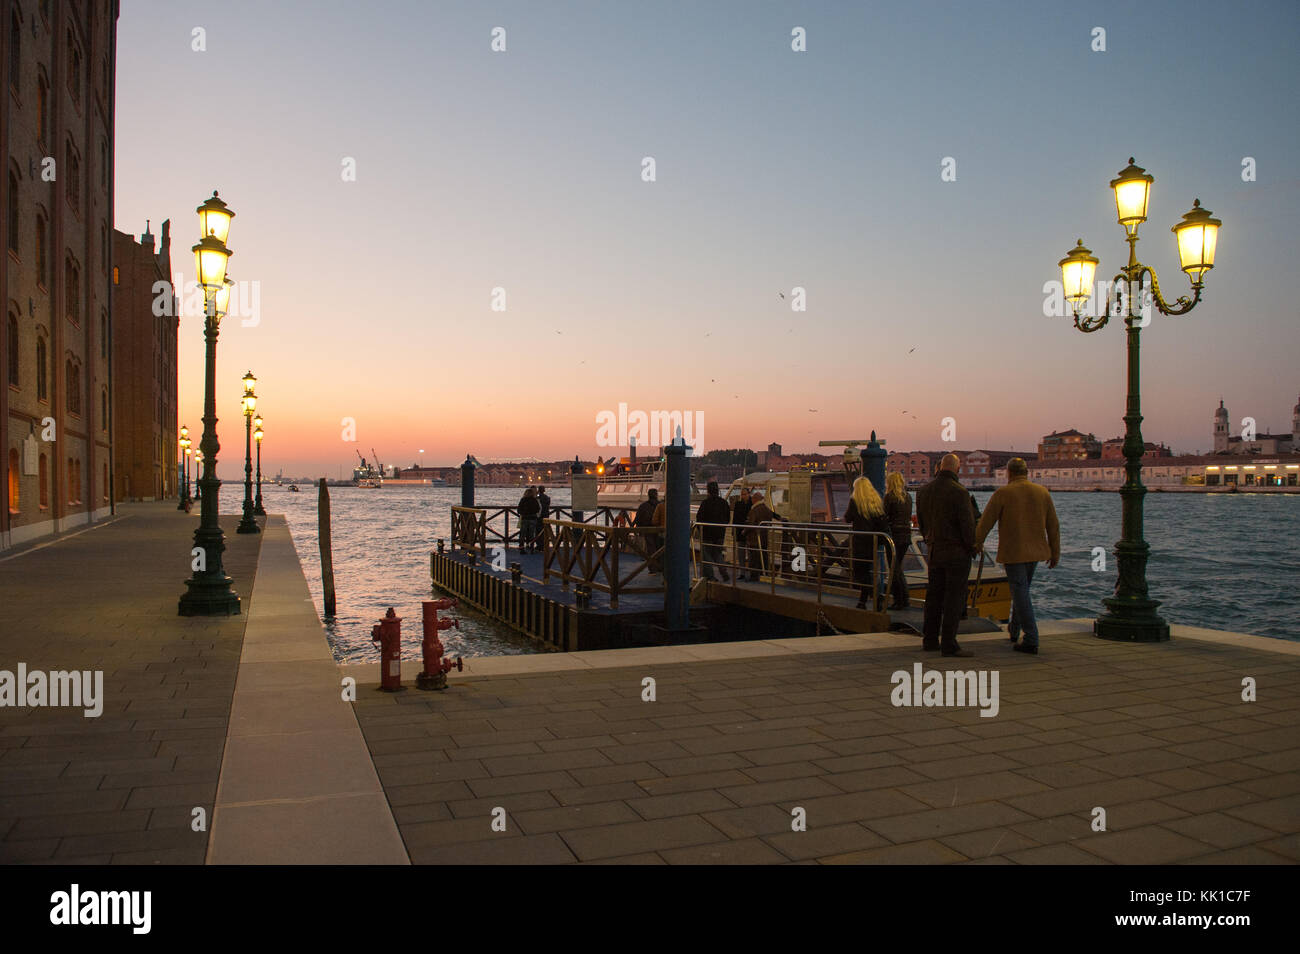 Vaporetto landing at dusk from Giudecca towards Dorsoduro in Venice - Stock Image